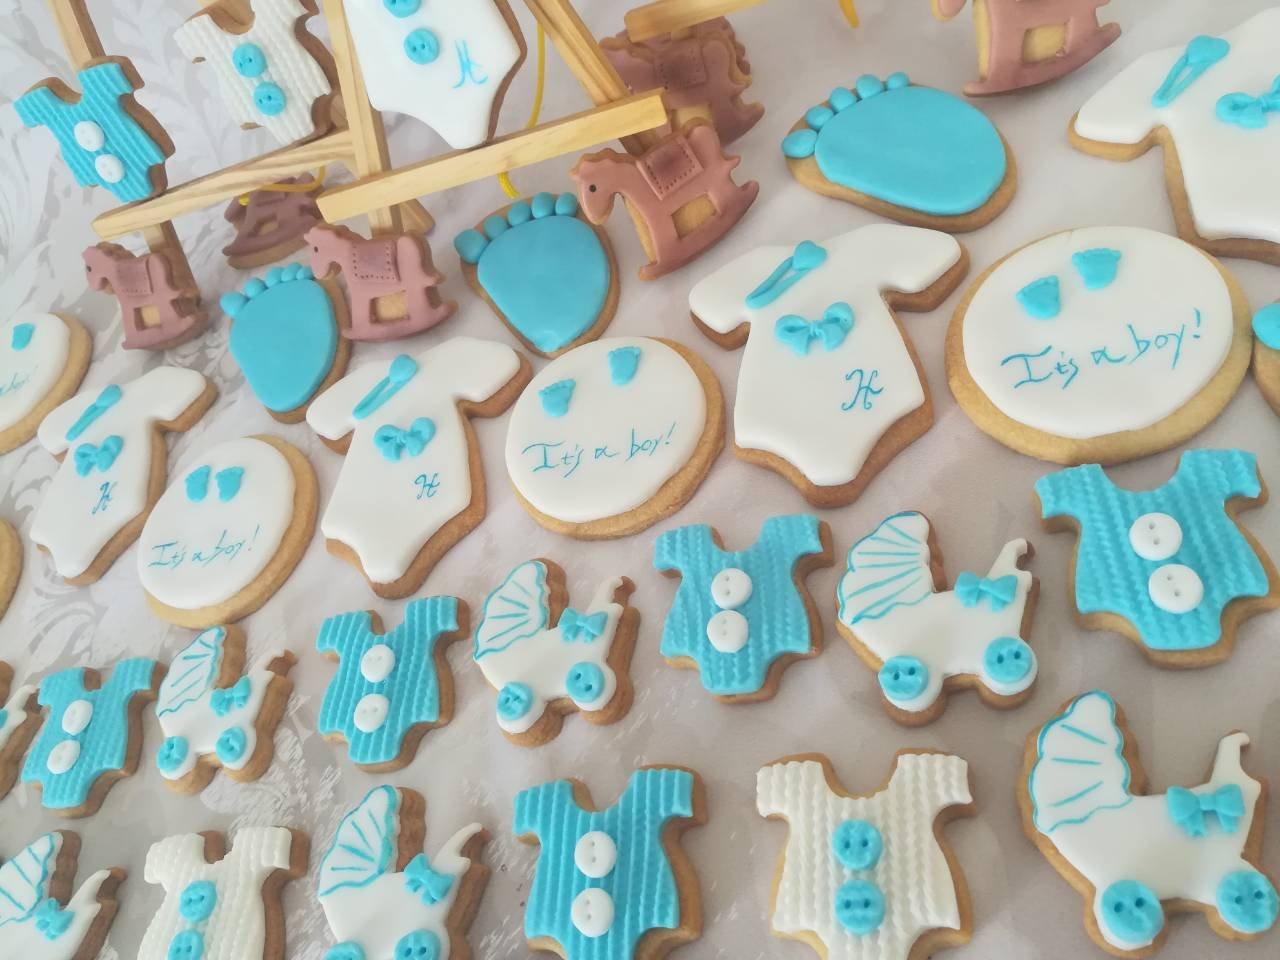 cookies από ζαχαρόπαστα it's a boy, ζαχαροπλαστείο καλαμάτα madamecharlotte.gr, birth theme cookies and partycakes 2d 3d confectionery patisserie kalamata